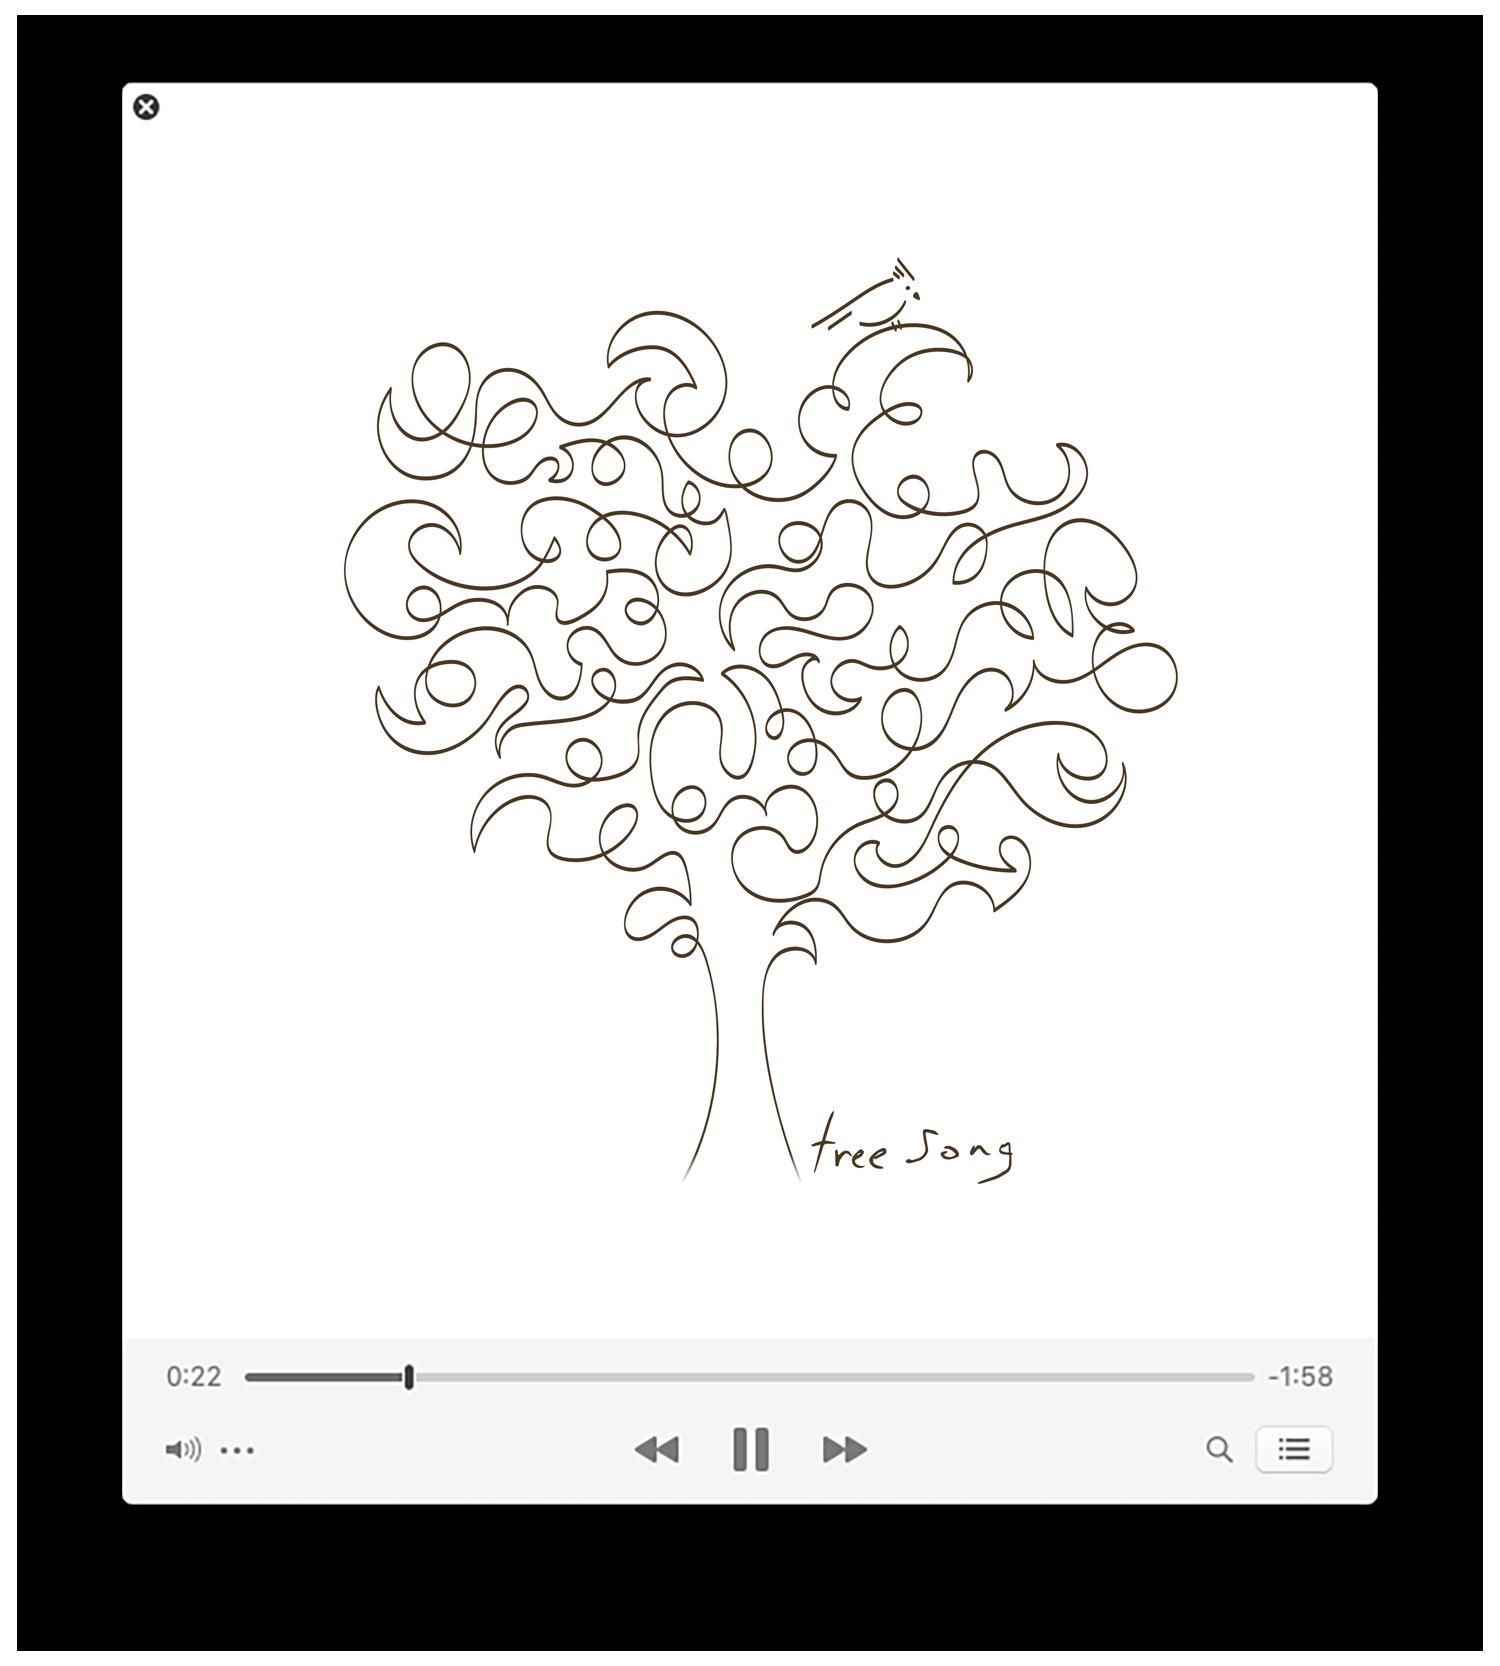 Tree Song Album Art